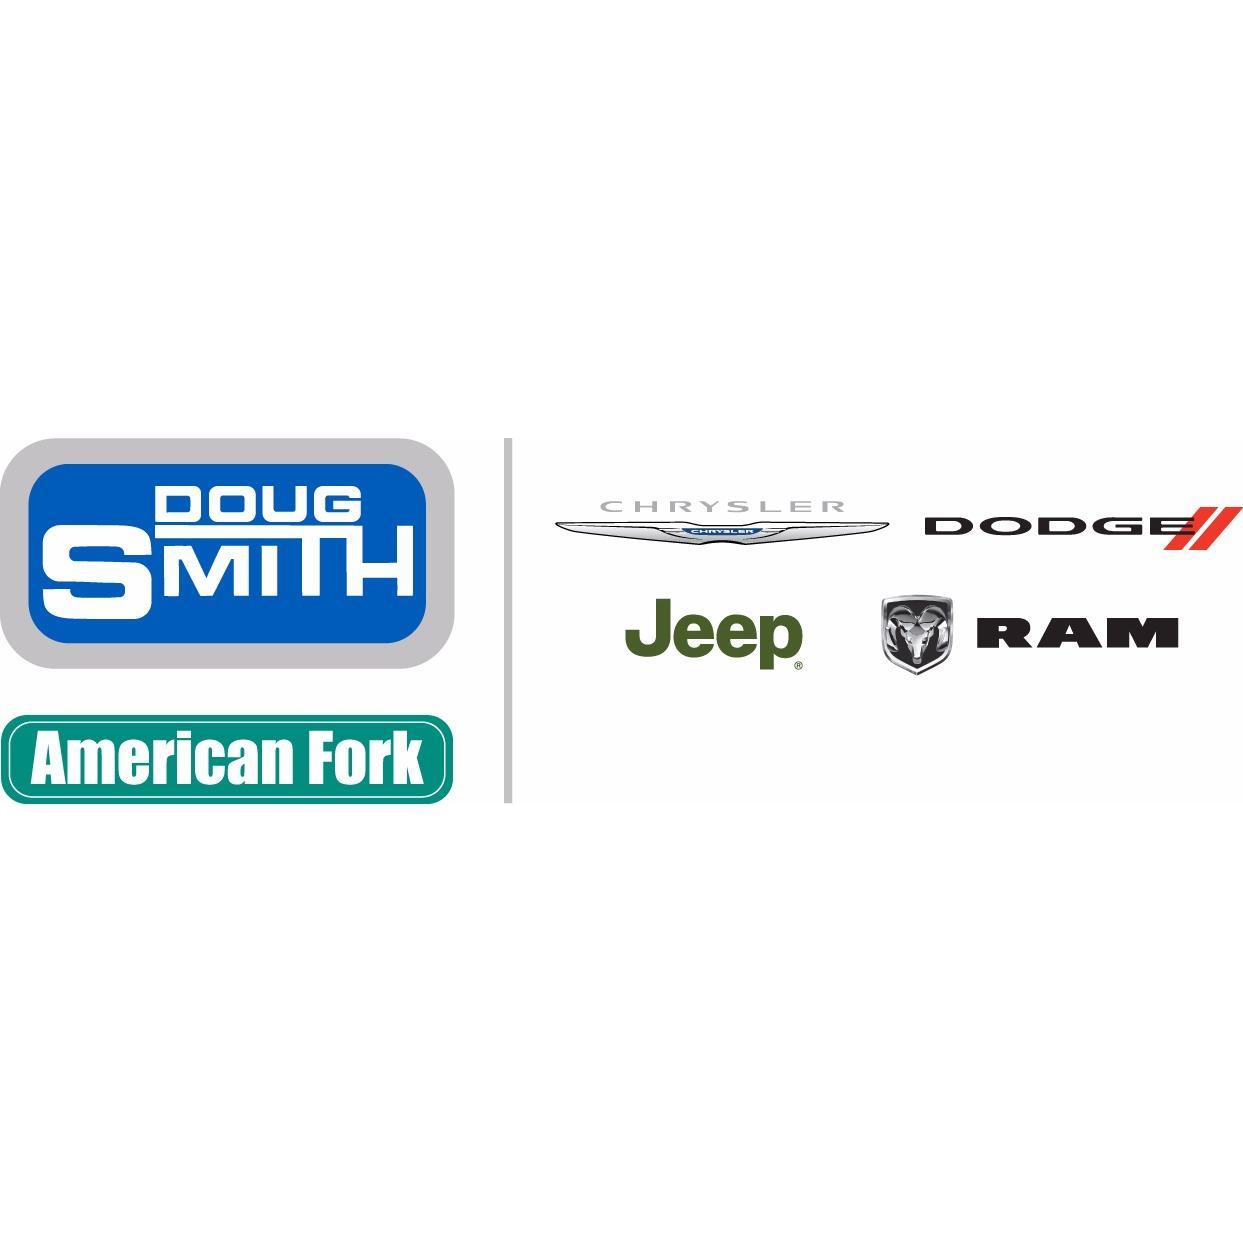 Doug Smith Chrysler Dodge Jeep Ram